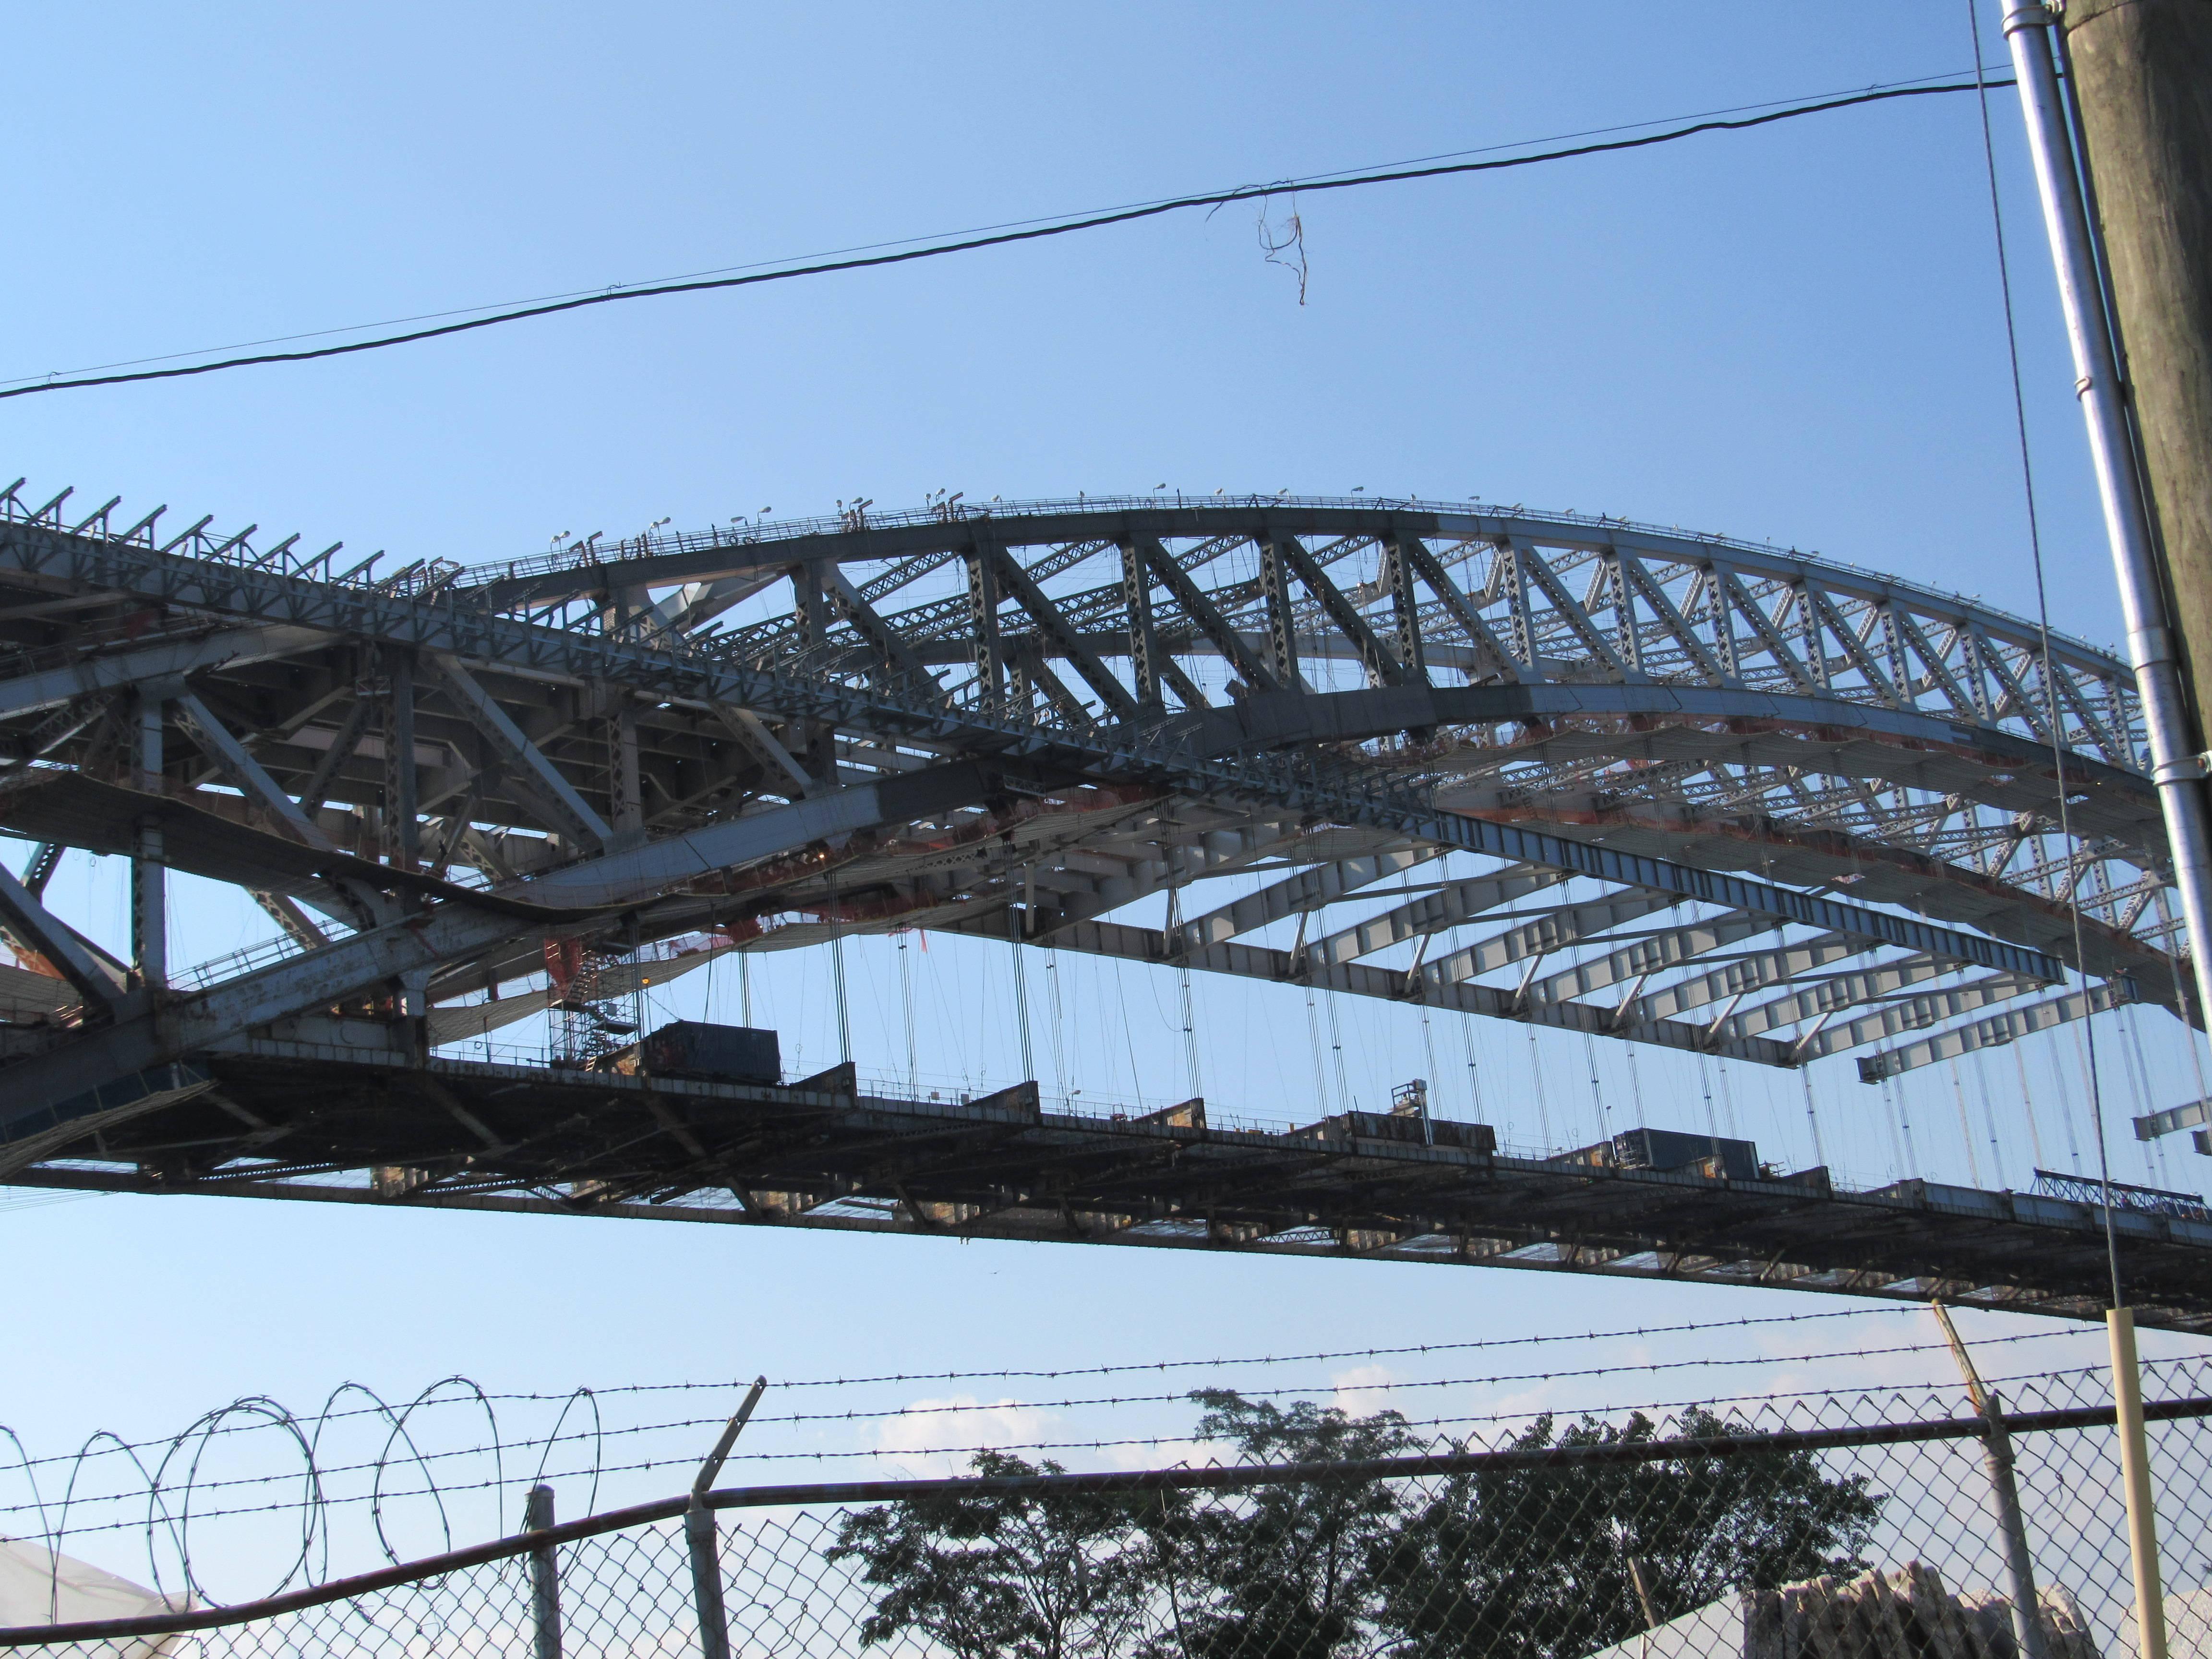 235568efbd4e499c17c1_Bridge_Used_F080516.JPG